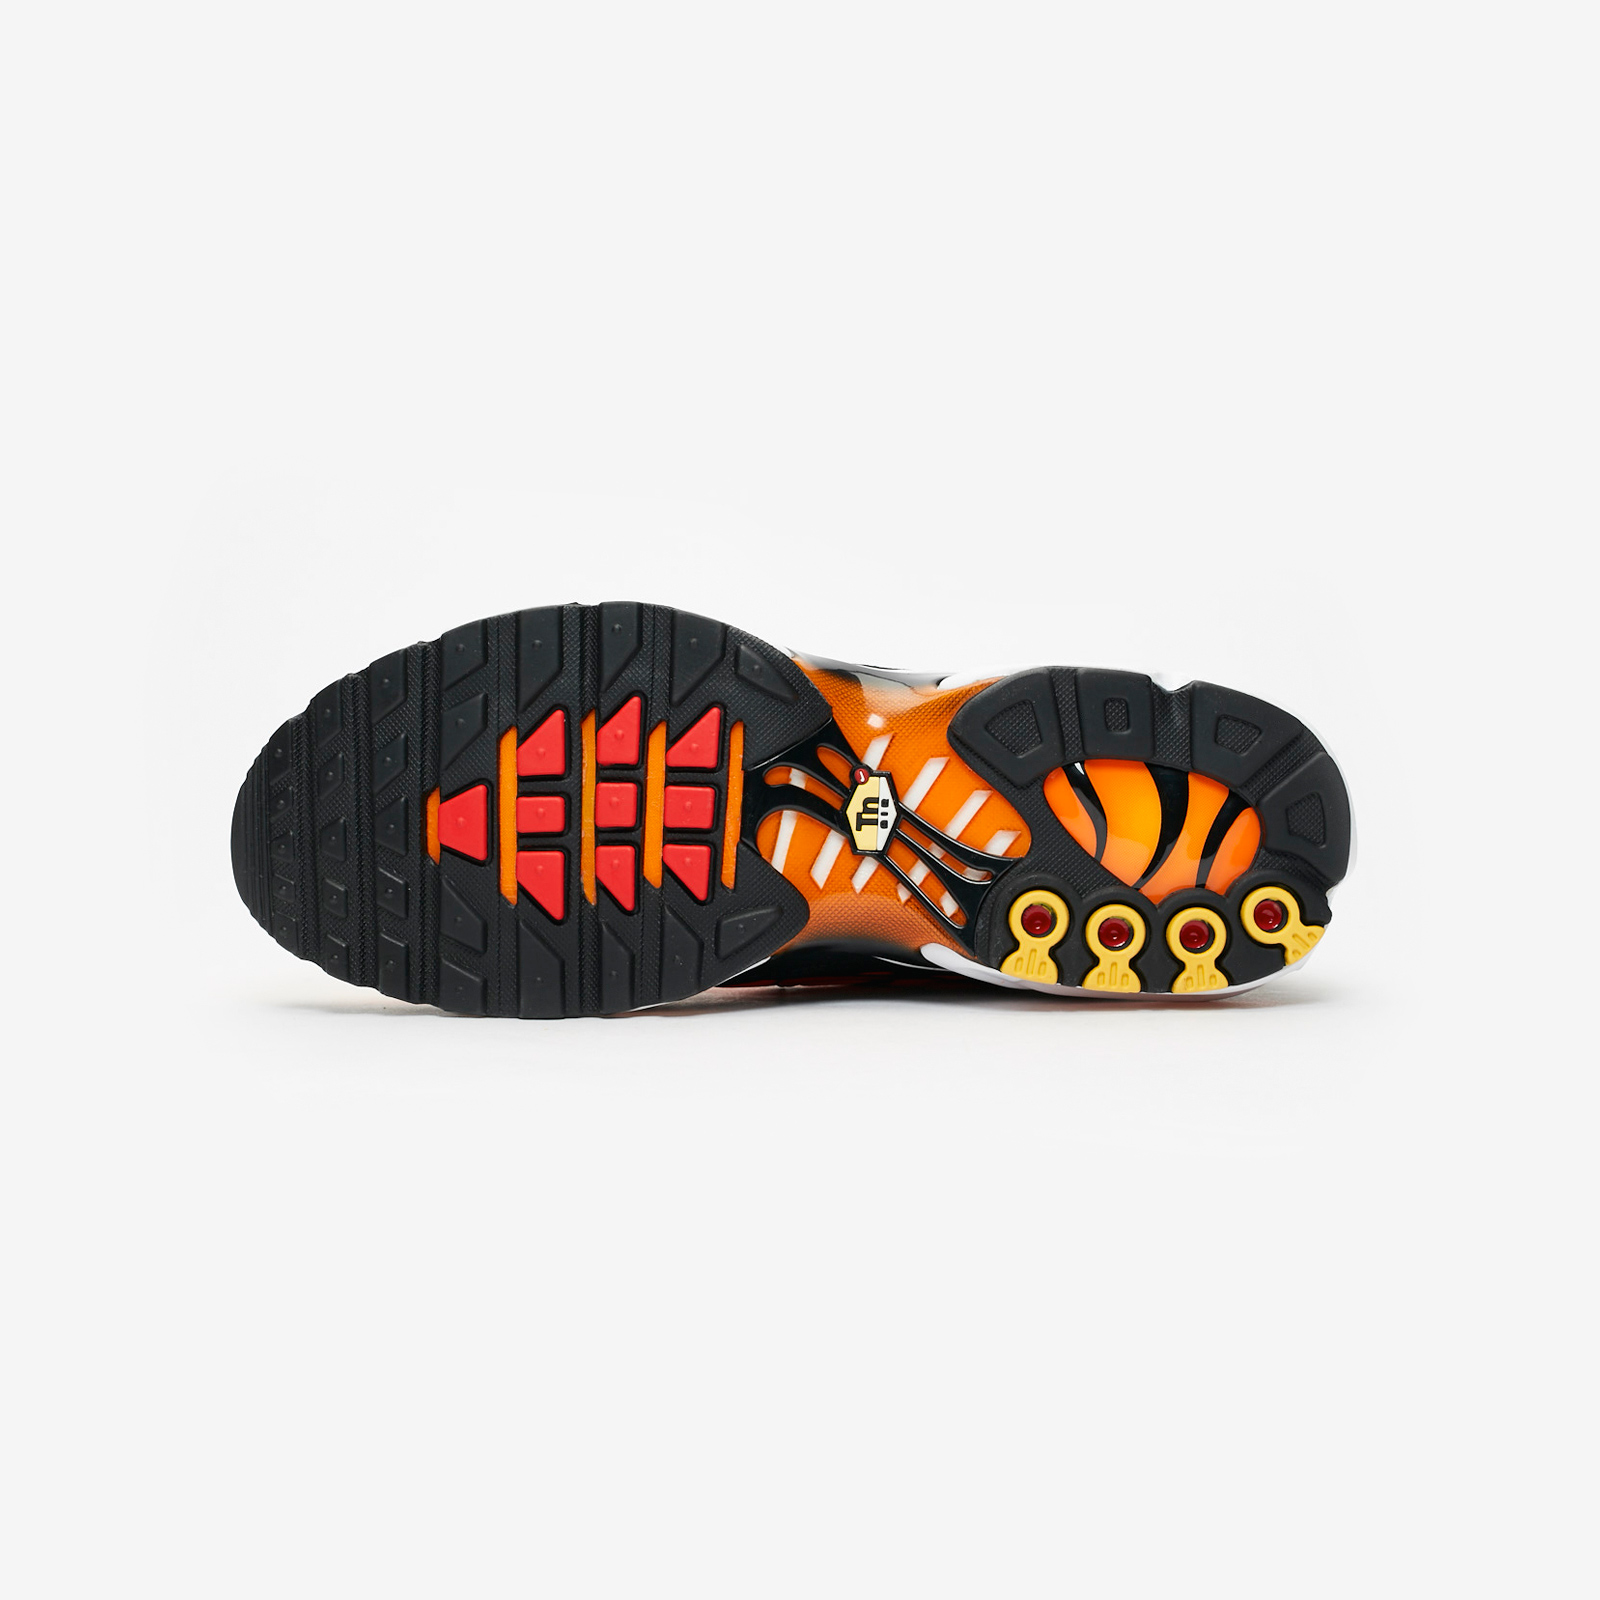 online store 510a5 027f1 Nike Air Max Plus OG - Bq4629-001 - Sneakersnstuff I ...